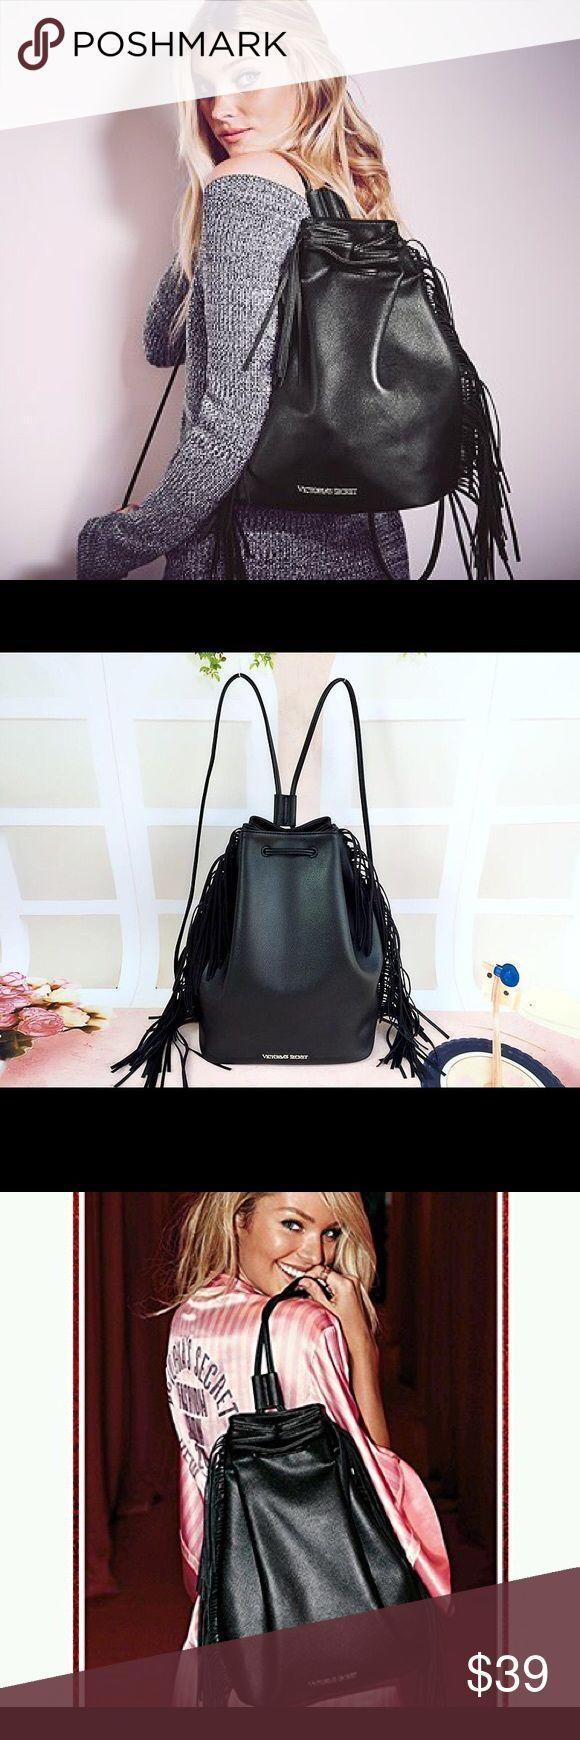 VS Fashion Show Black Fringe Backpack NWT VS Fashion Show Black Fringe Backpack NWT so cute!! Victoria's Secret Bags